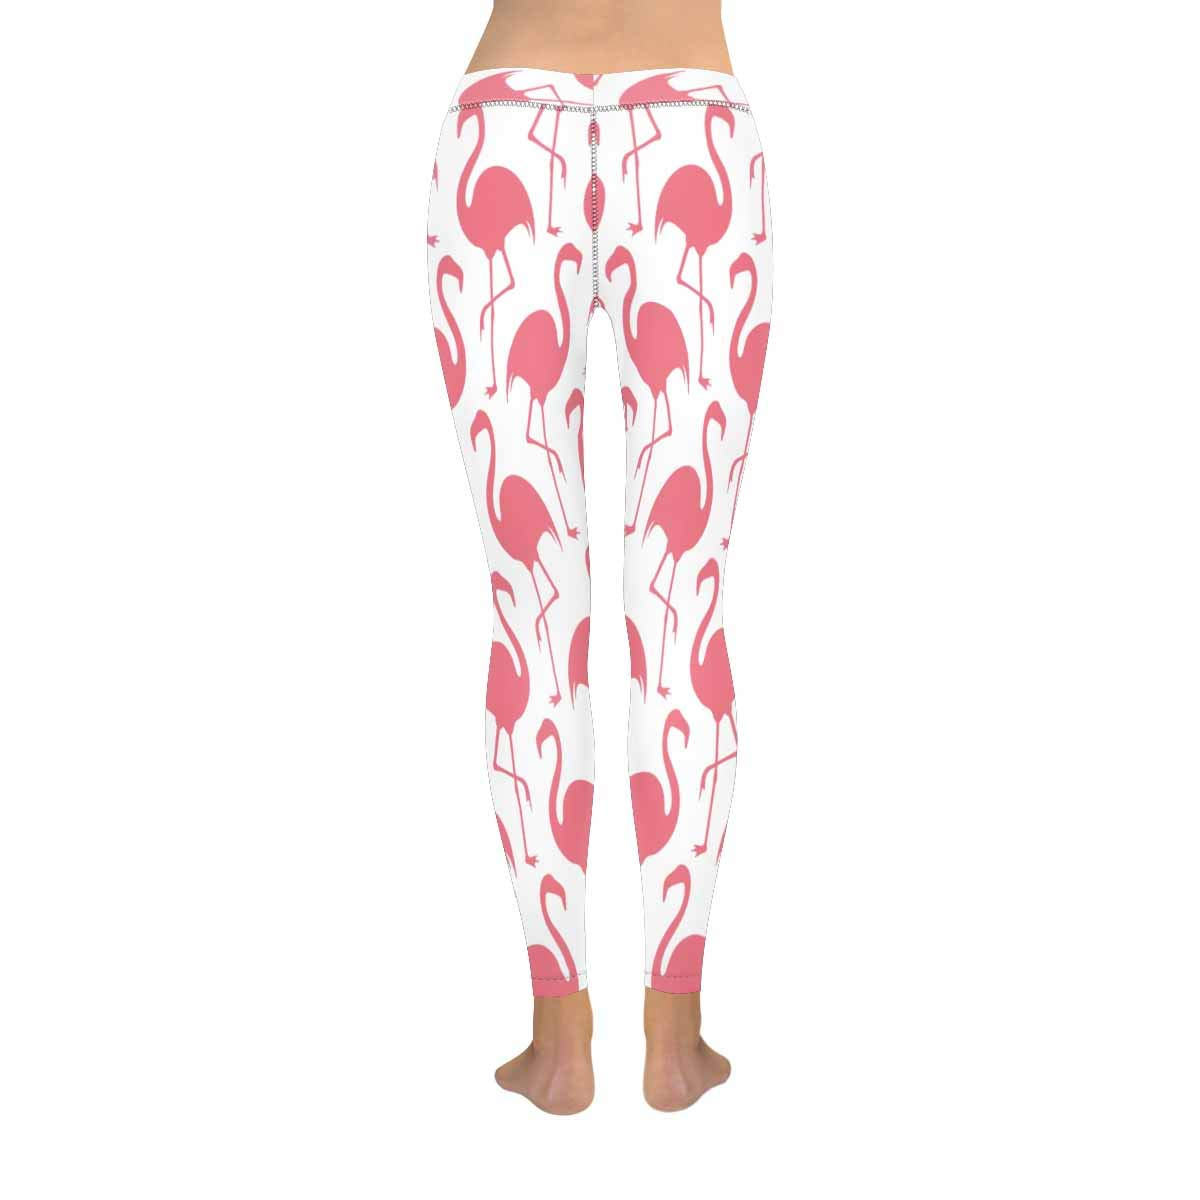 InterestPrint Womens Low Rise Leggings Flamingo Pink Full Length Soft Slim Yoga Pants XXS-5XL